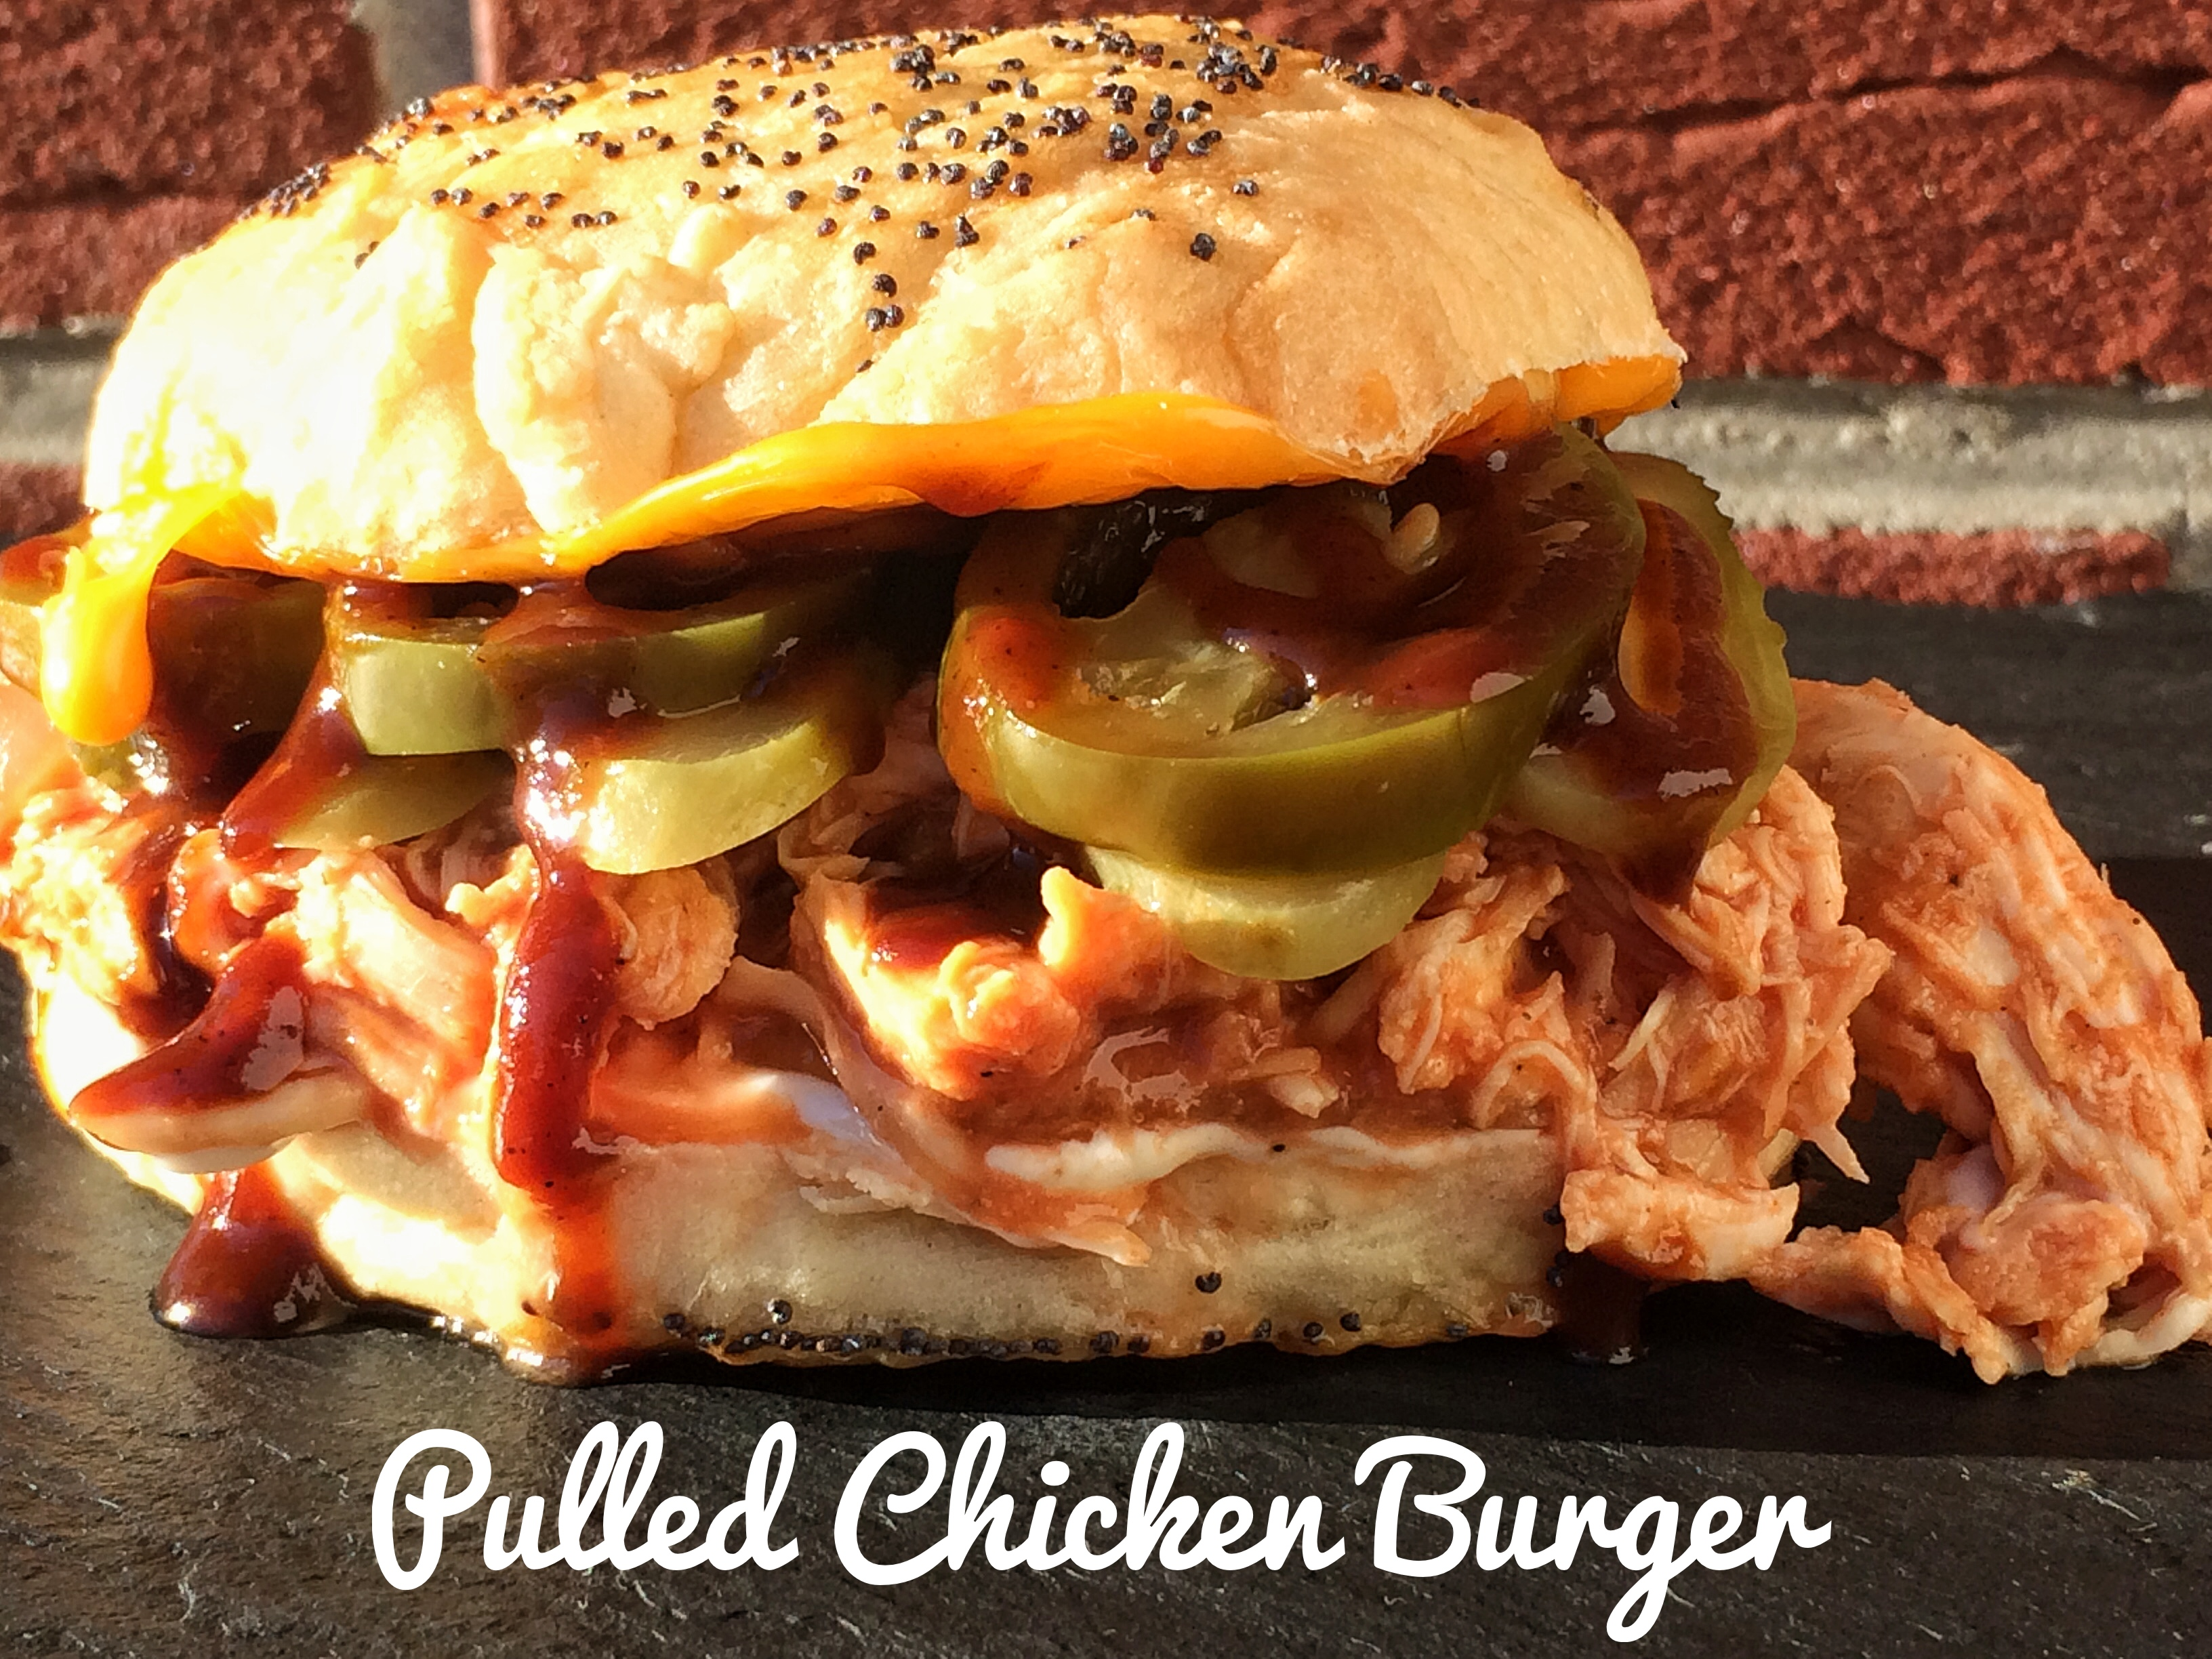 Pulled Chicken Burger, yuuumy